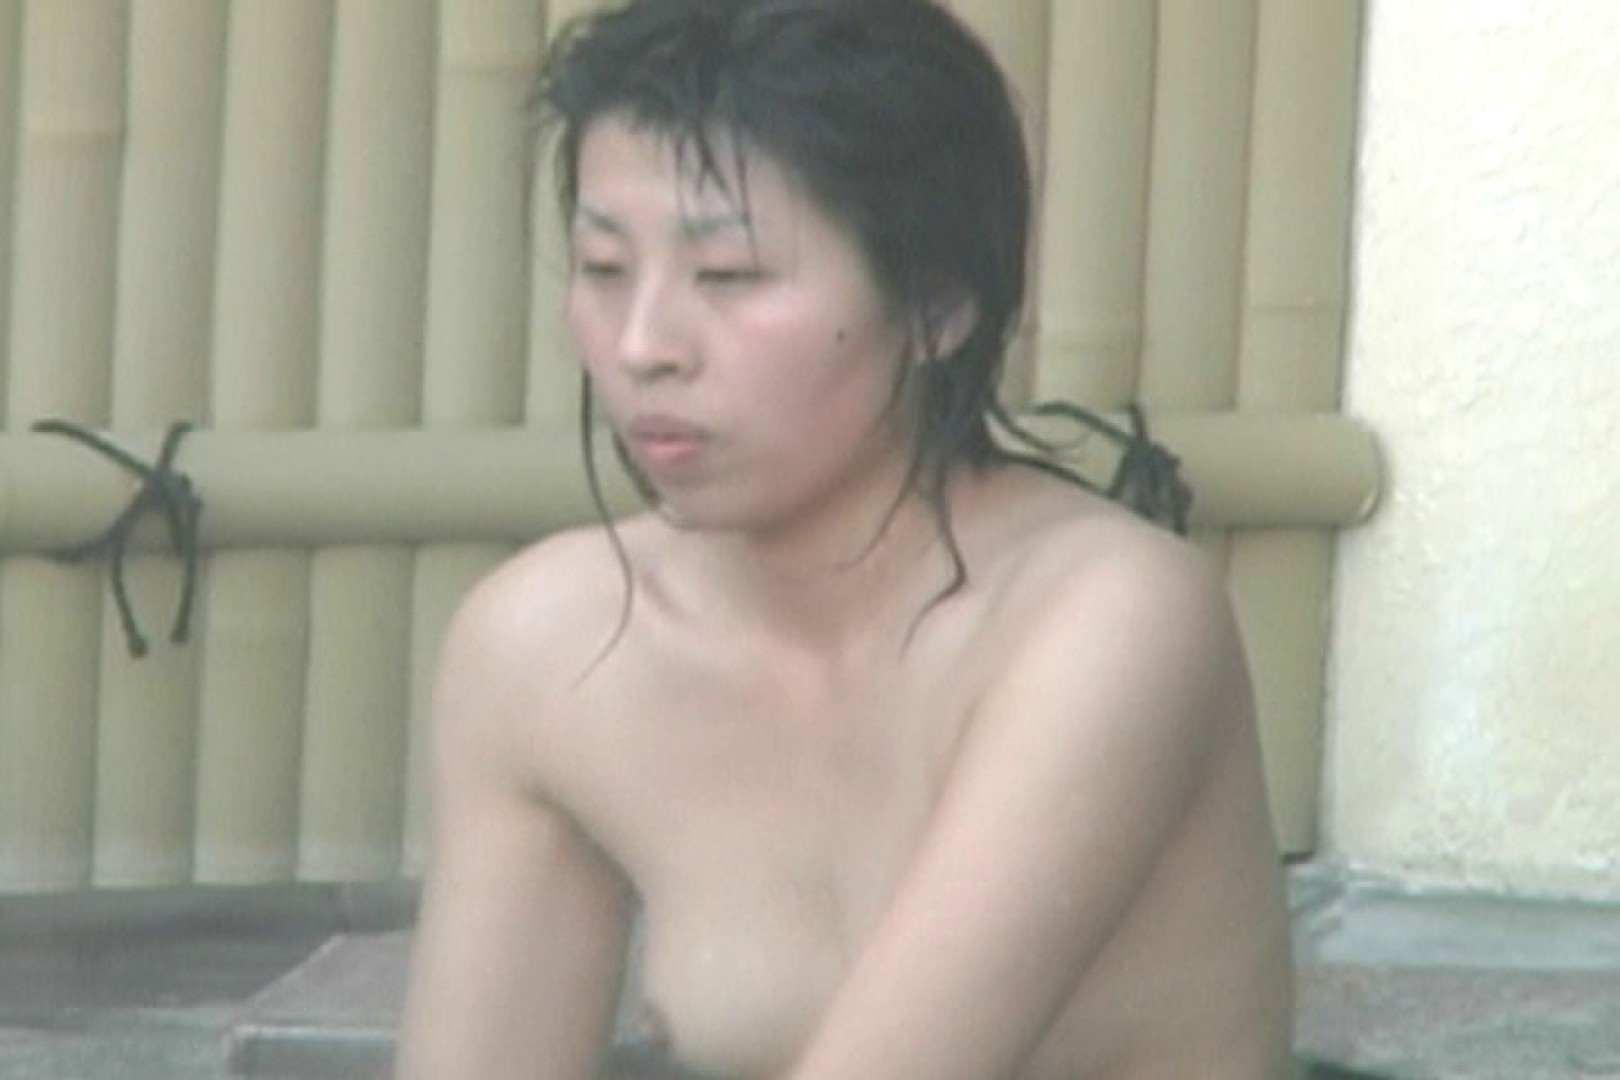 Aquaな露天風呂Vol.589 0  74連発 60